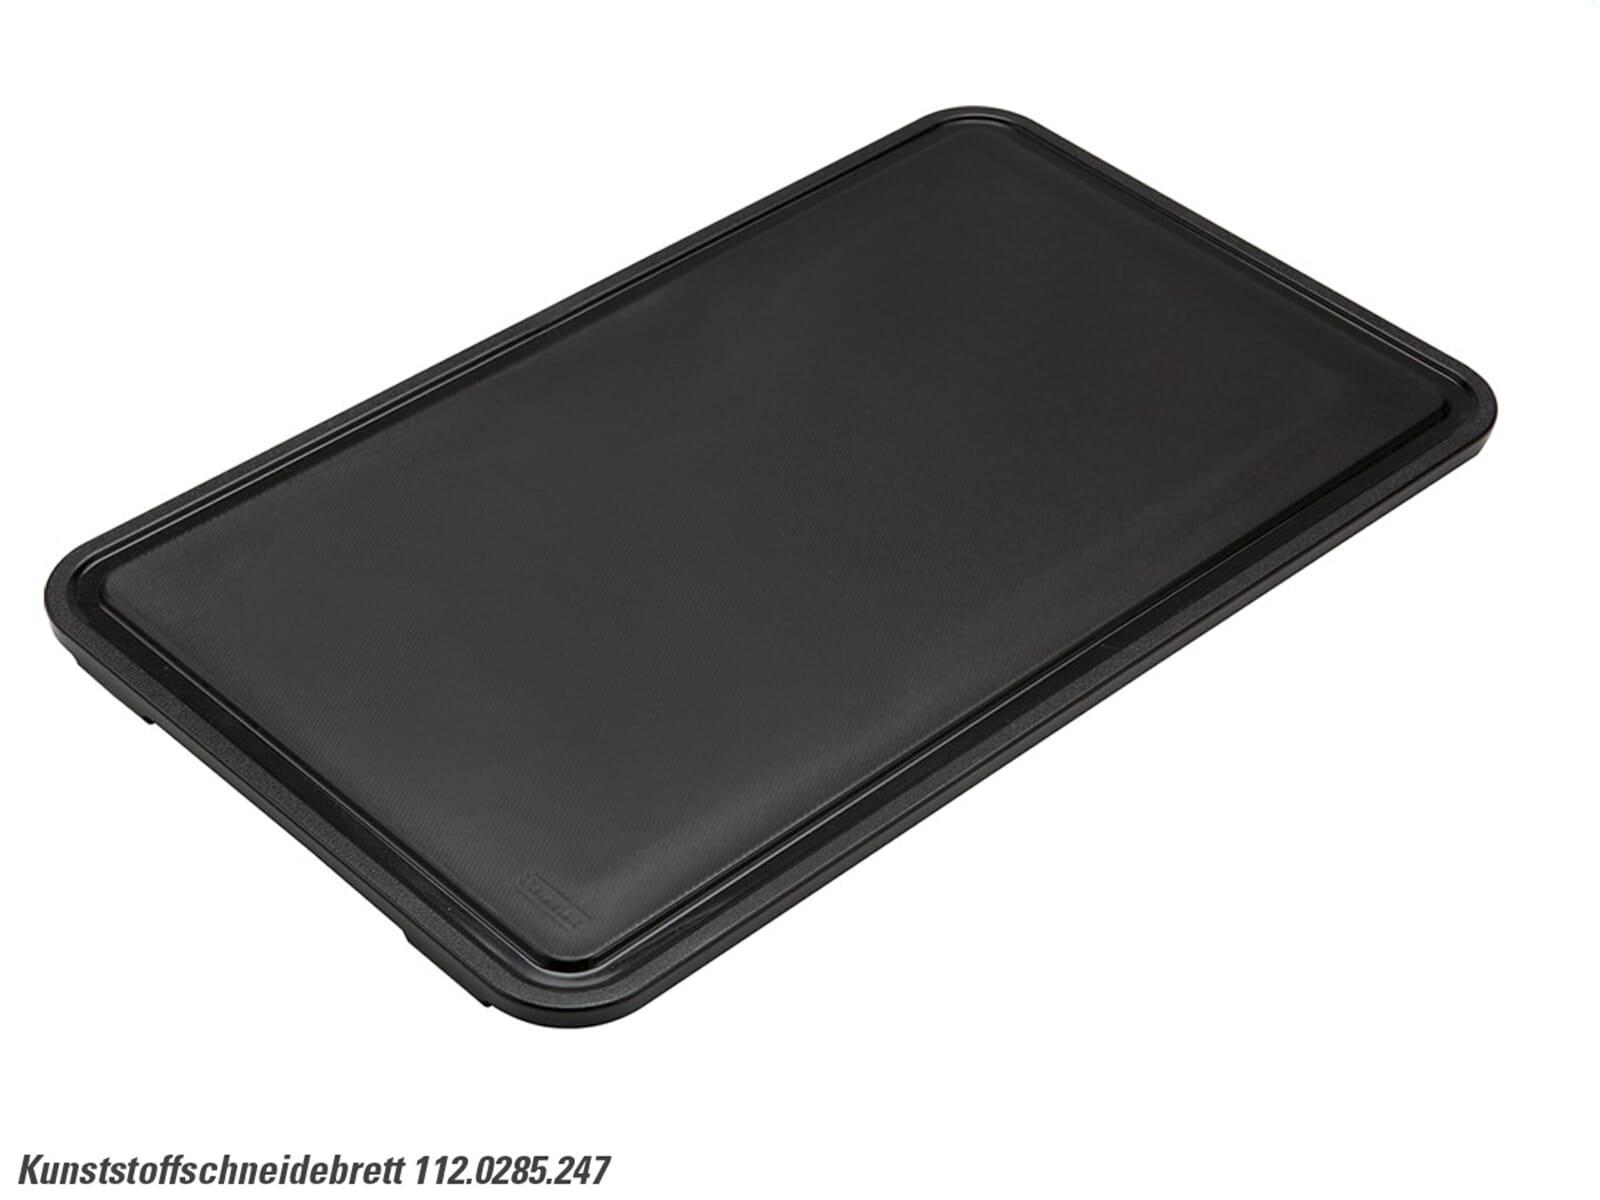 produktabbildung Franke 112.0285.247 Kunststoffschneidebrett schwarz